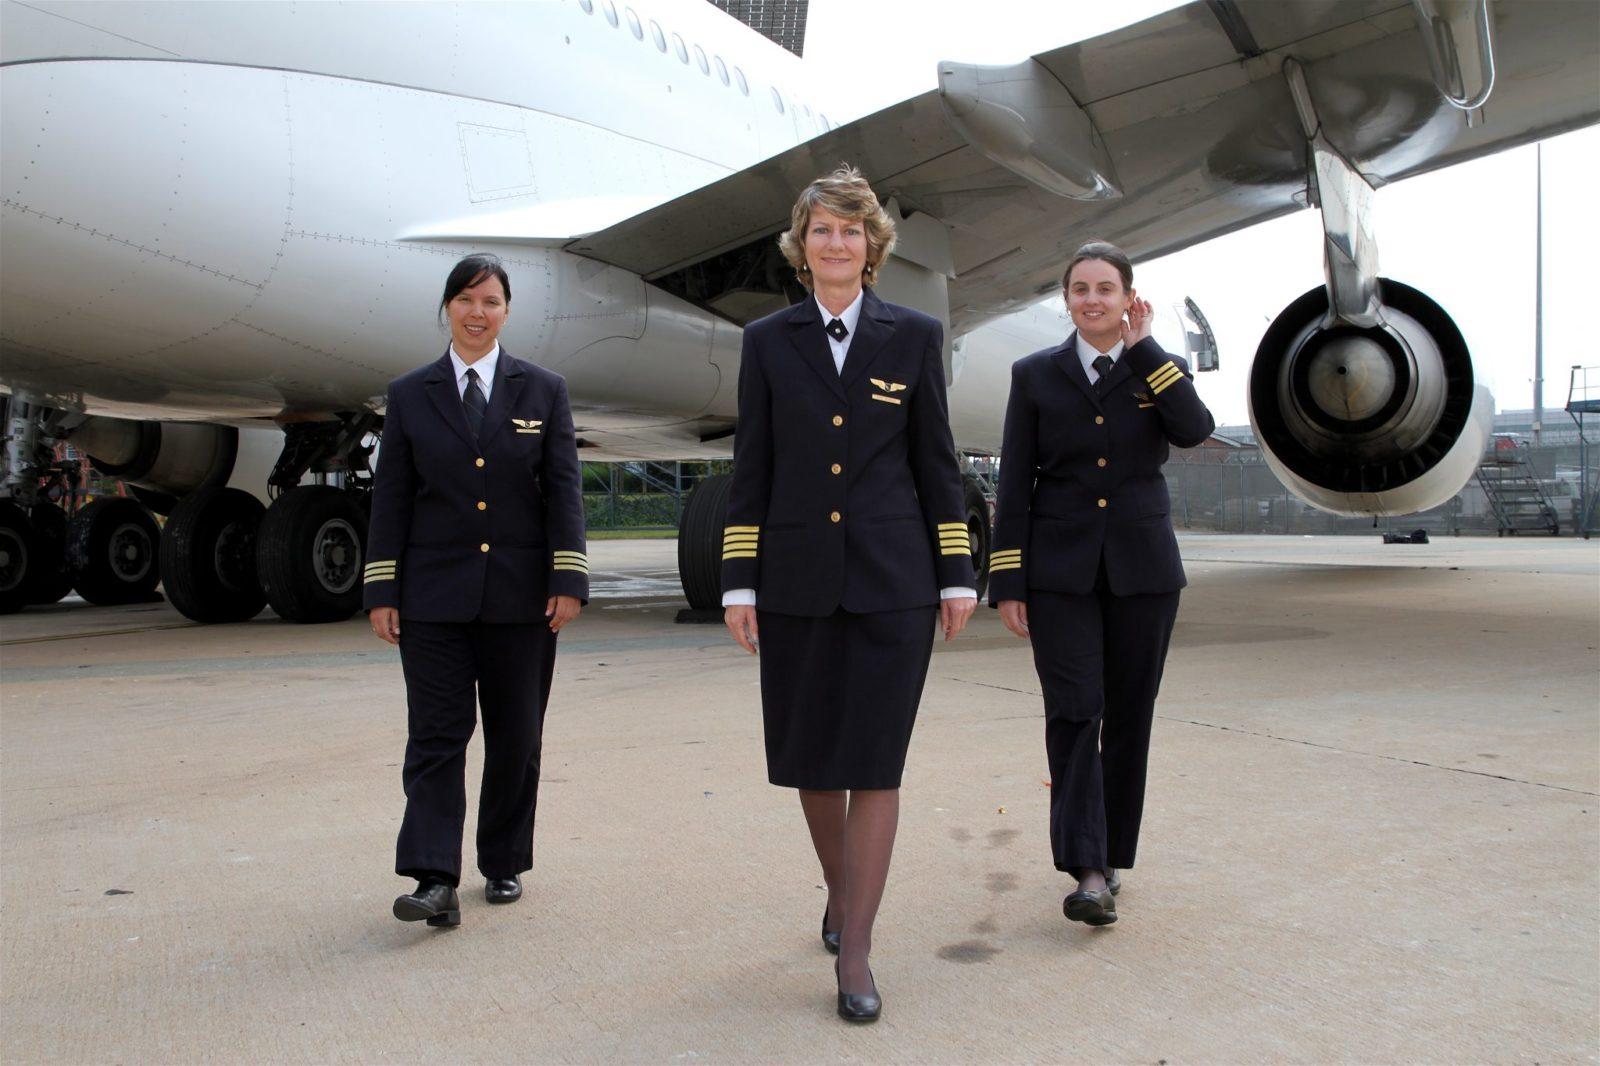 Women Power At 30,000ft